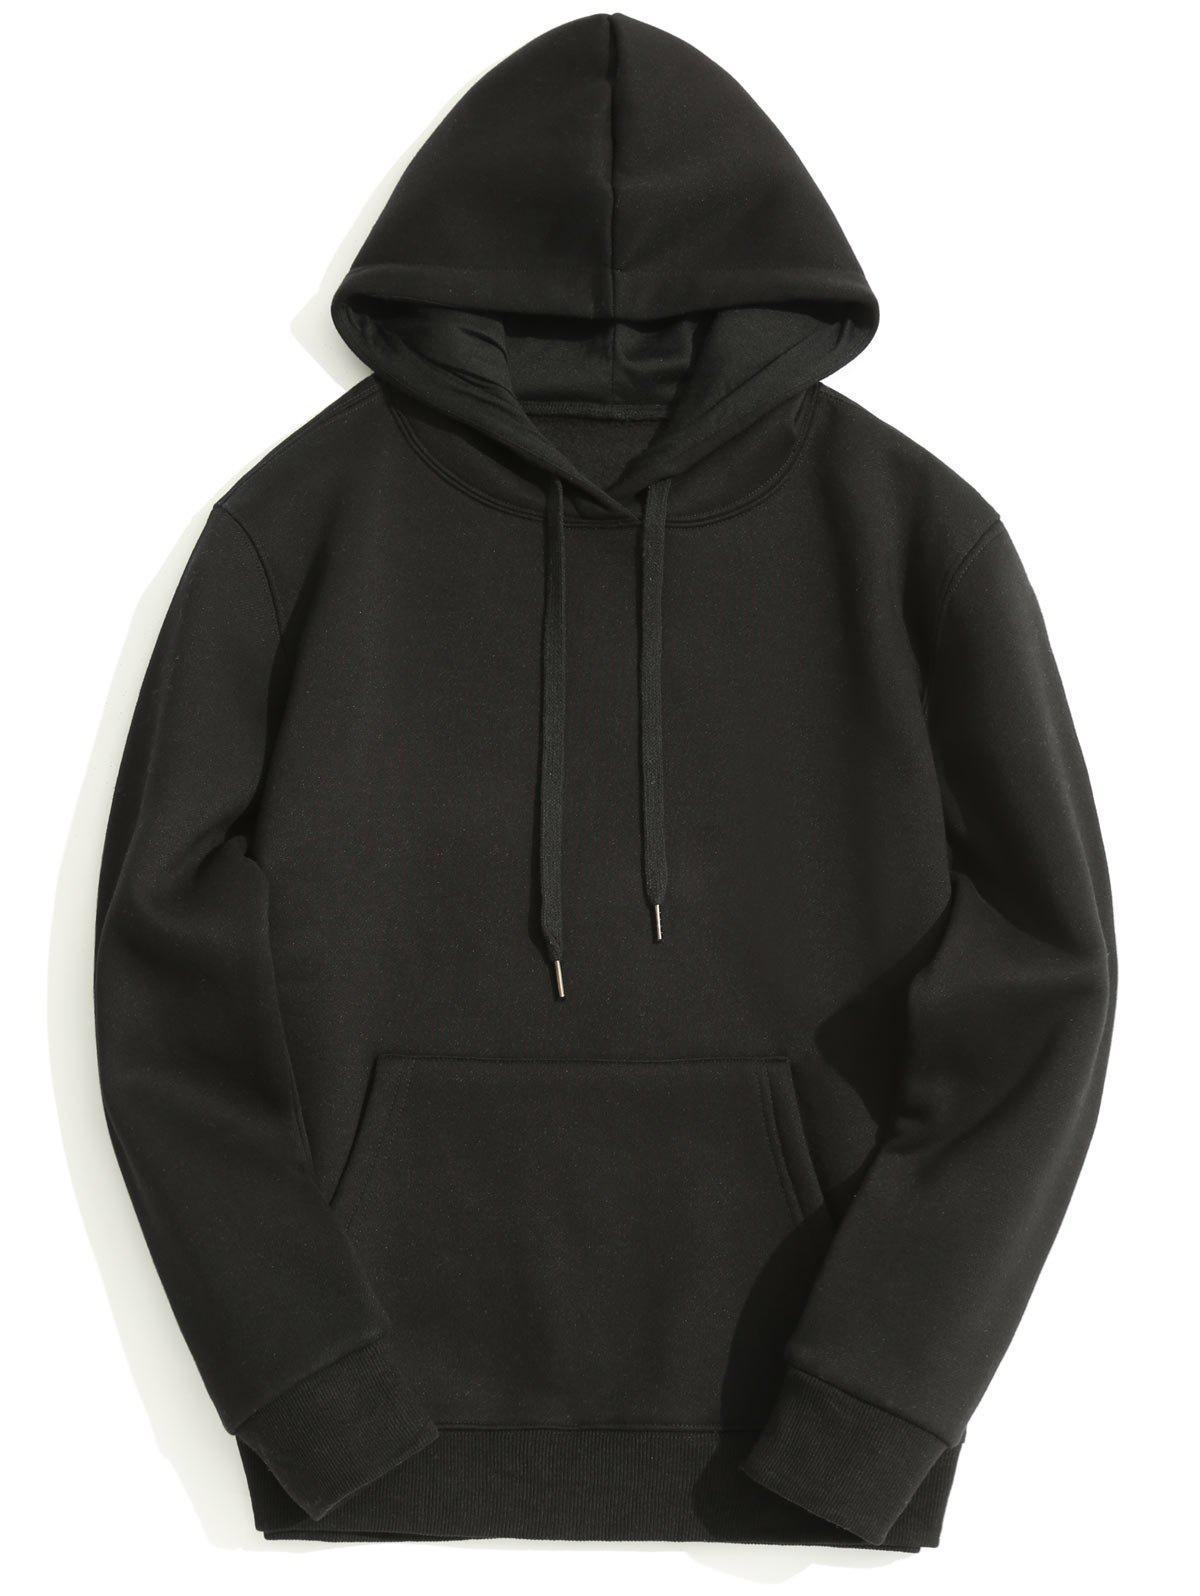 Fleece Lining Kangaroo Pocket Hoodie 239159009